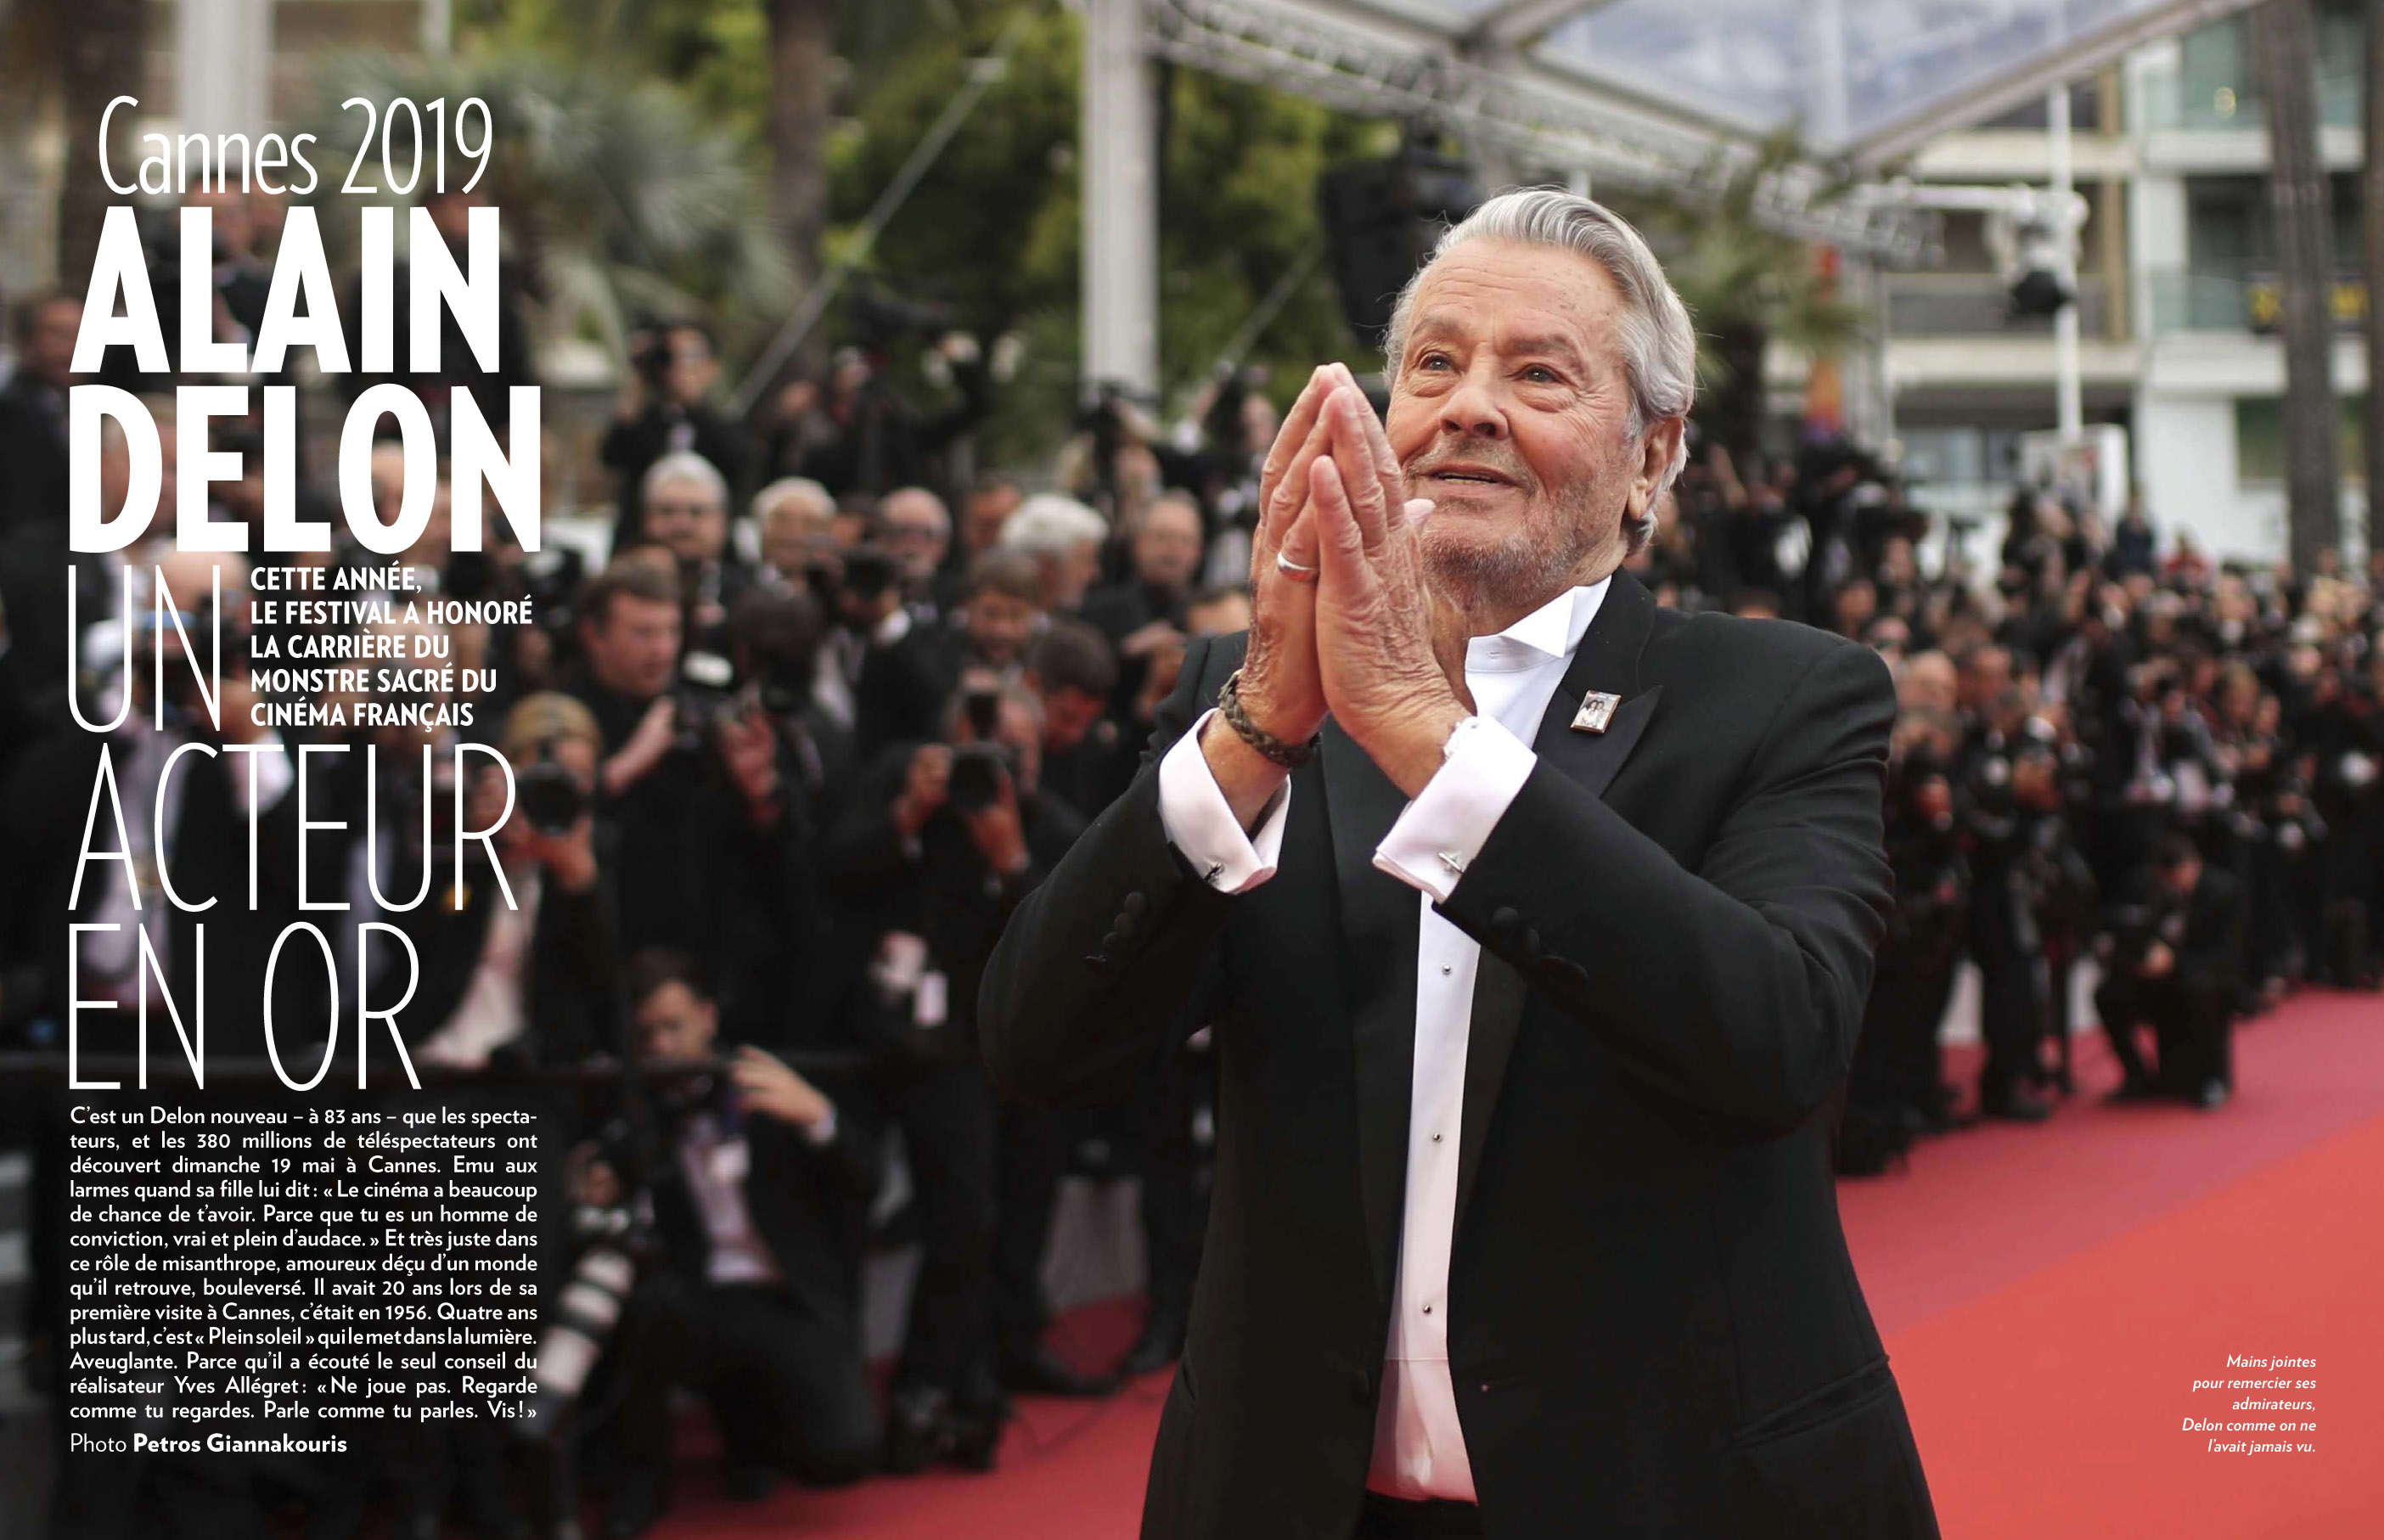 Paris Match 3654 2019-05-23 ADelon 02.jpg